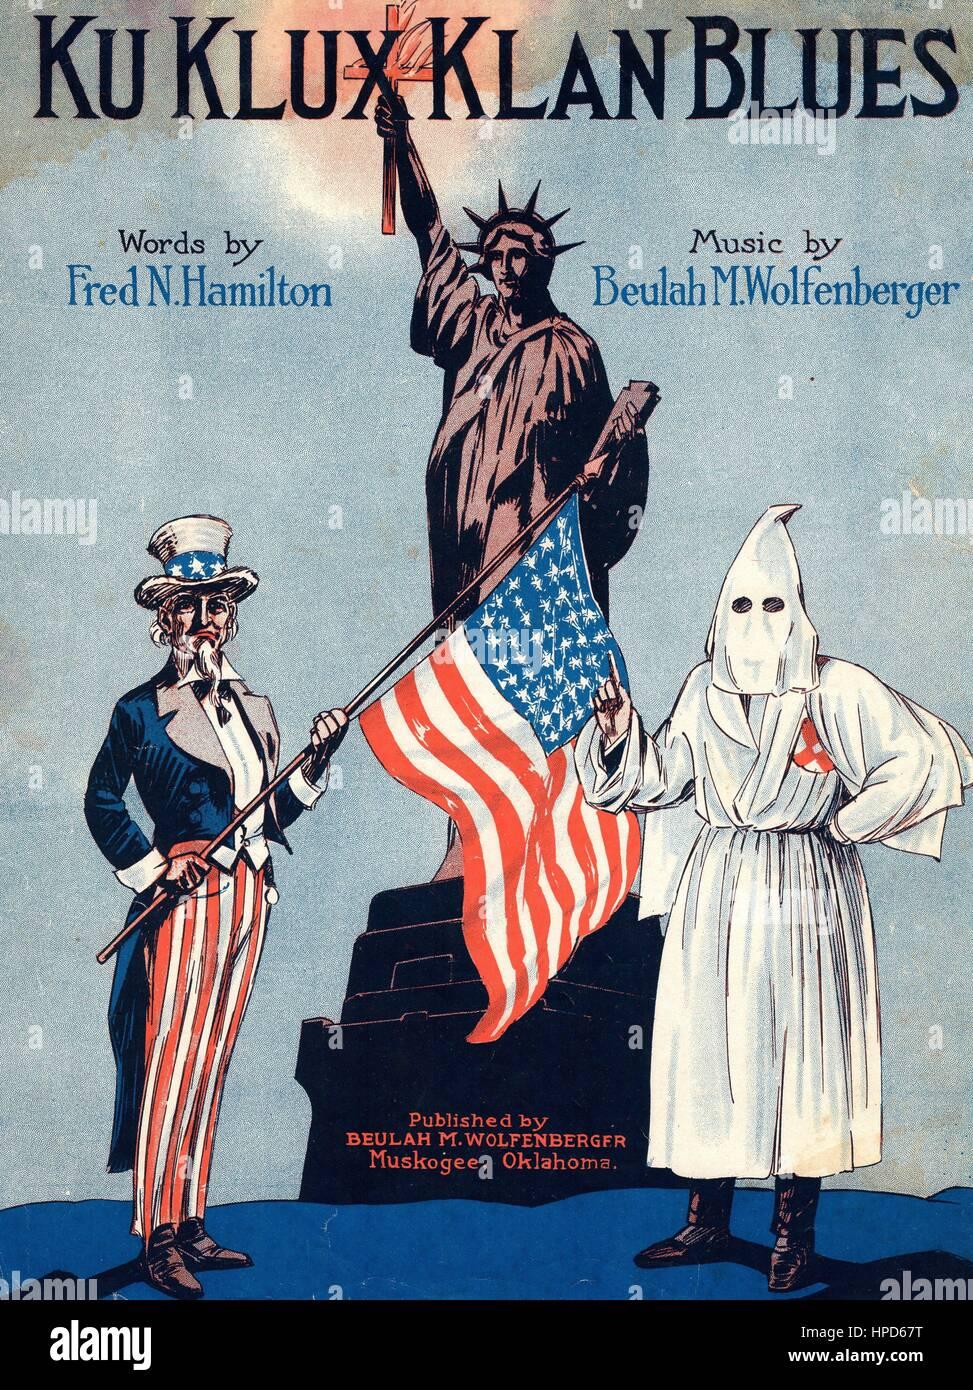 Ku Klux Klan Blues Sheet Music by Fred Hamilton & Beulah Wolfenberger. Published: Muskogee, Oklahoma. 1924. Stock Photo